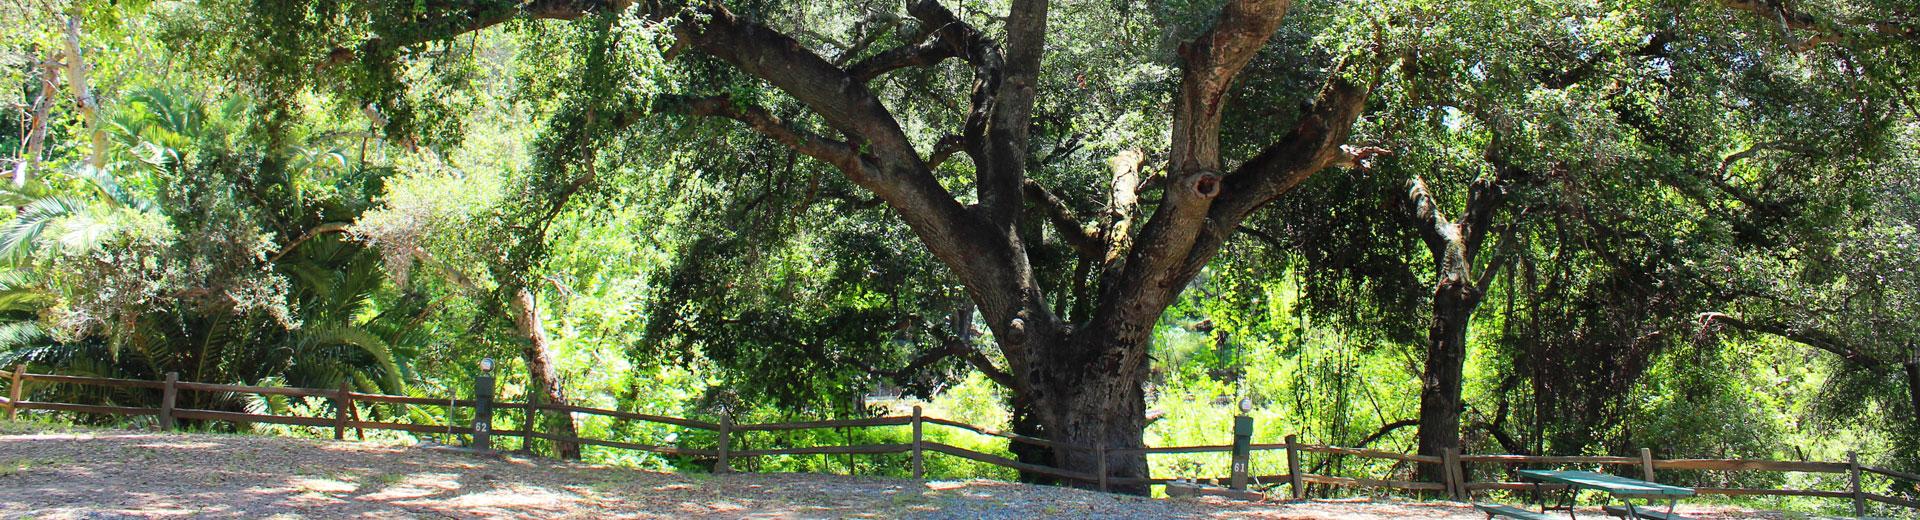 ramona-oaks-rv-resort